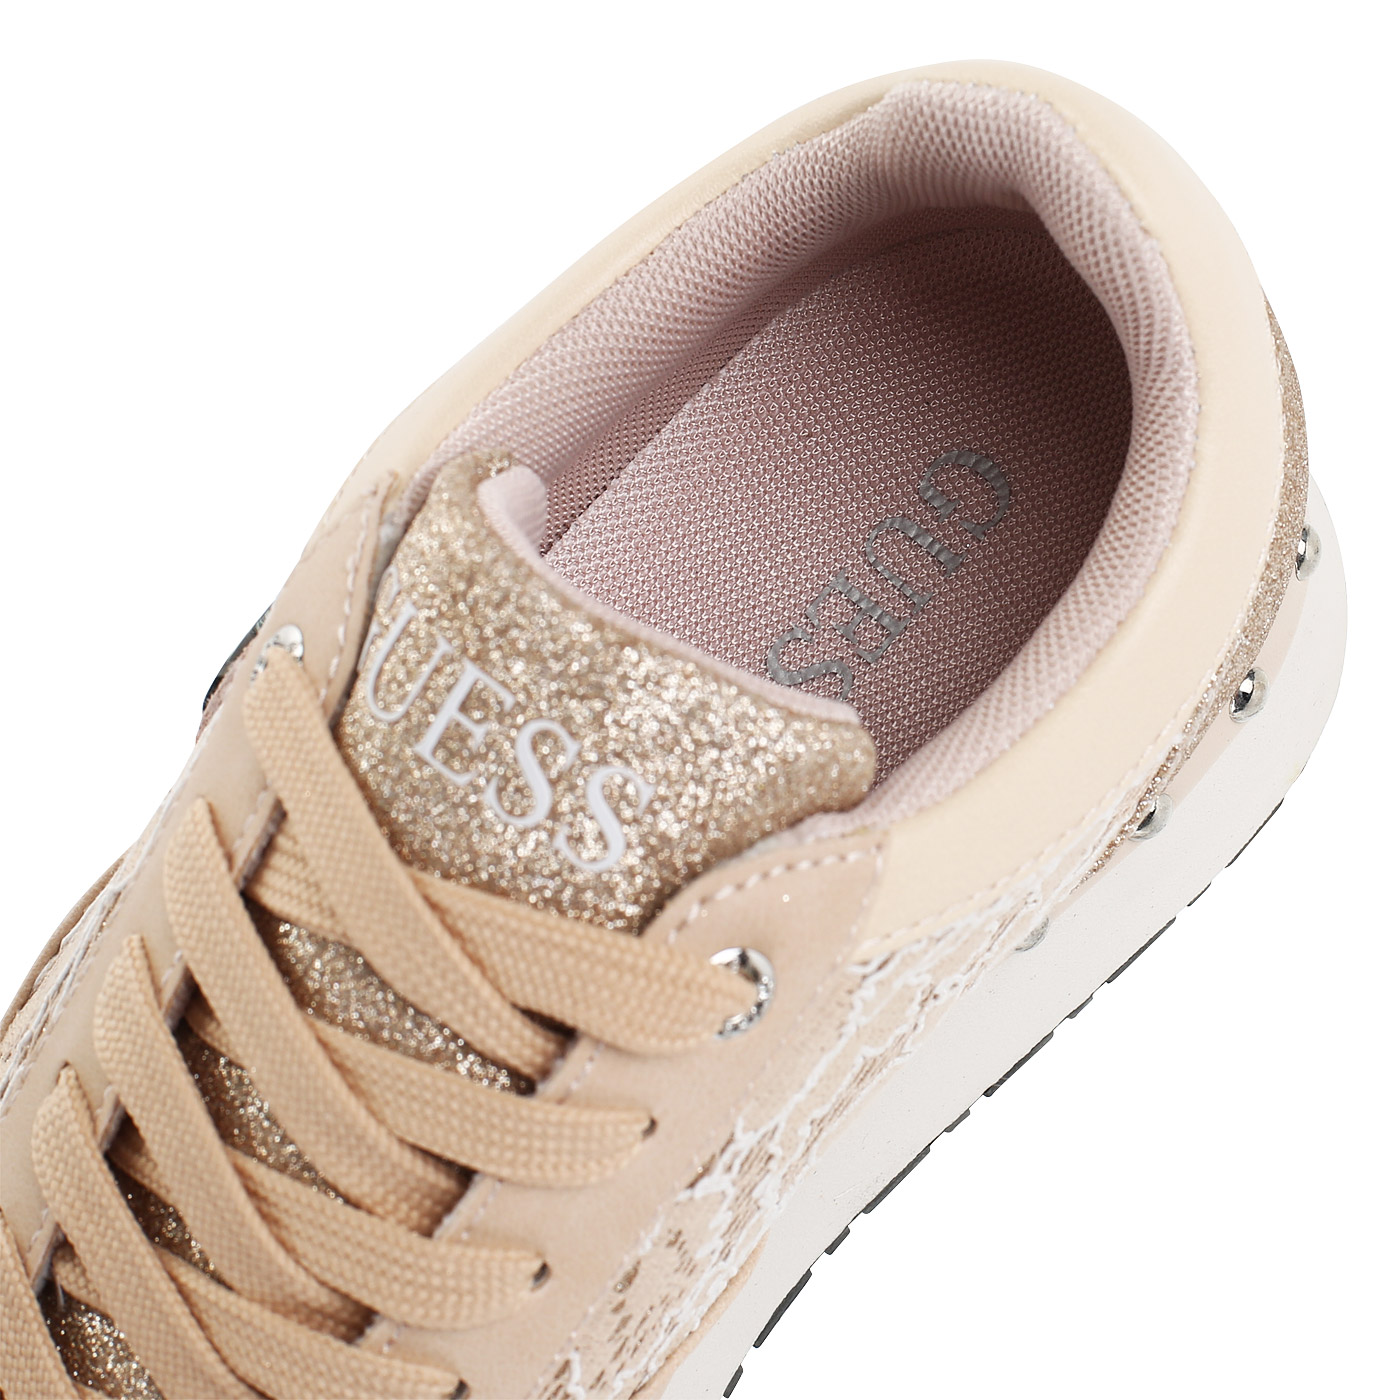 f492d584 Женские бежевые кроссовки на платформе Guess Tiffany FLTIF1 ...